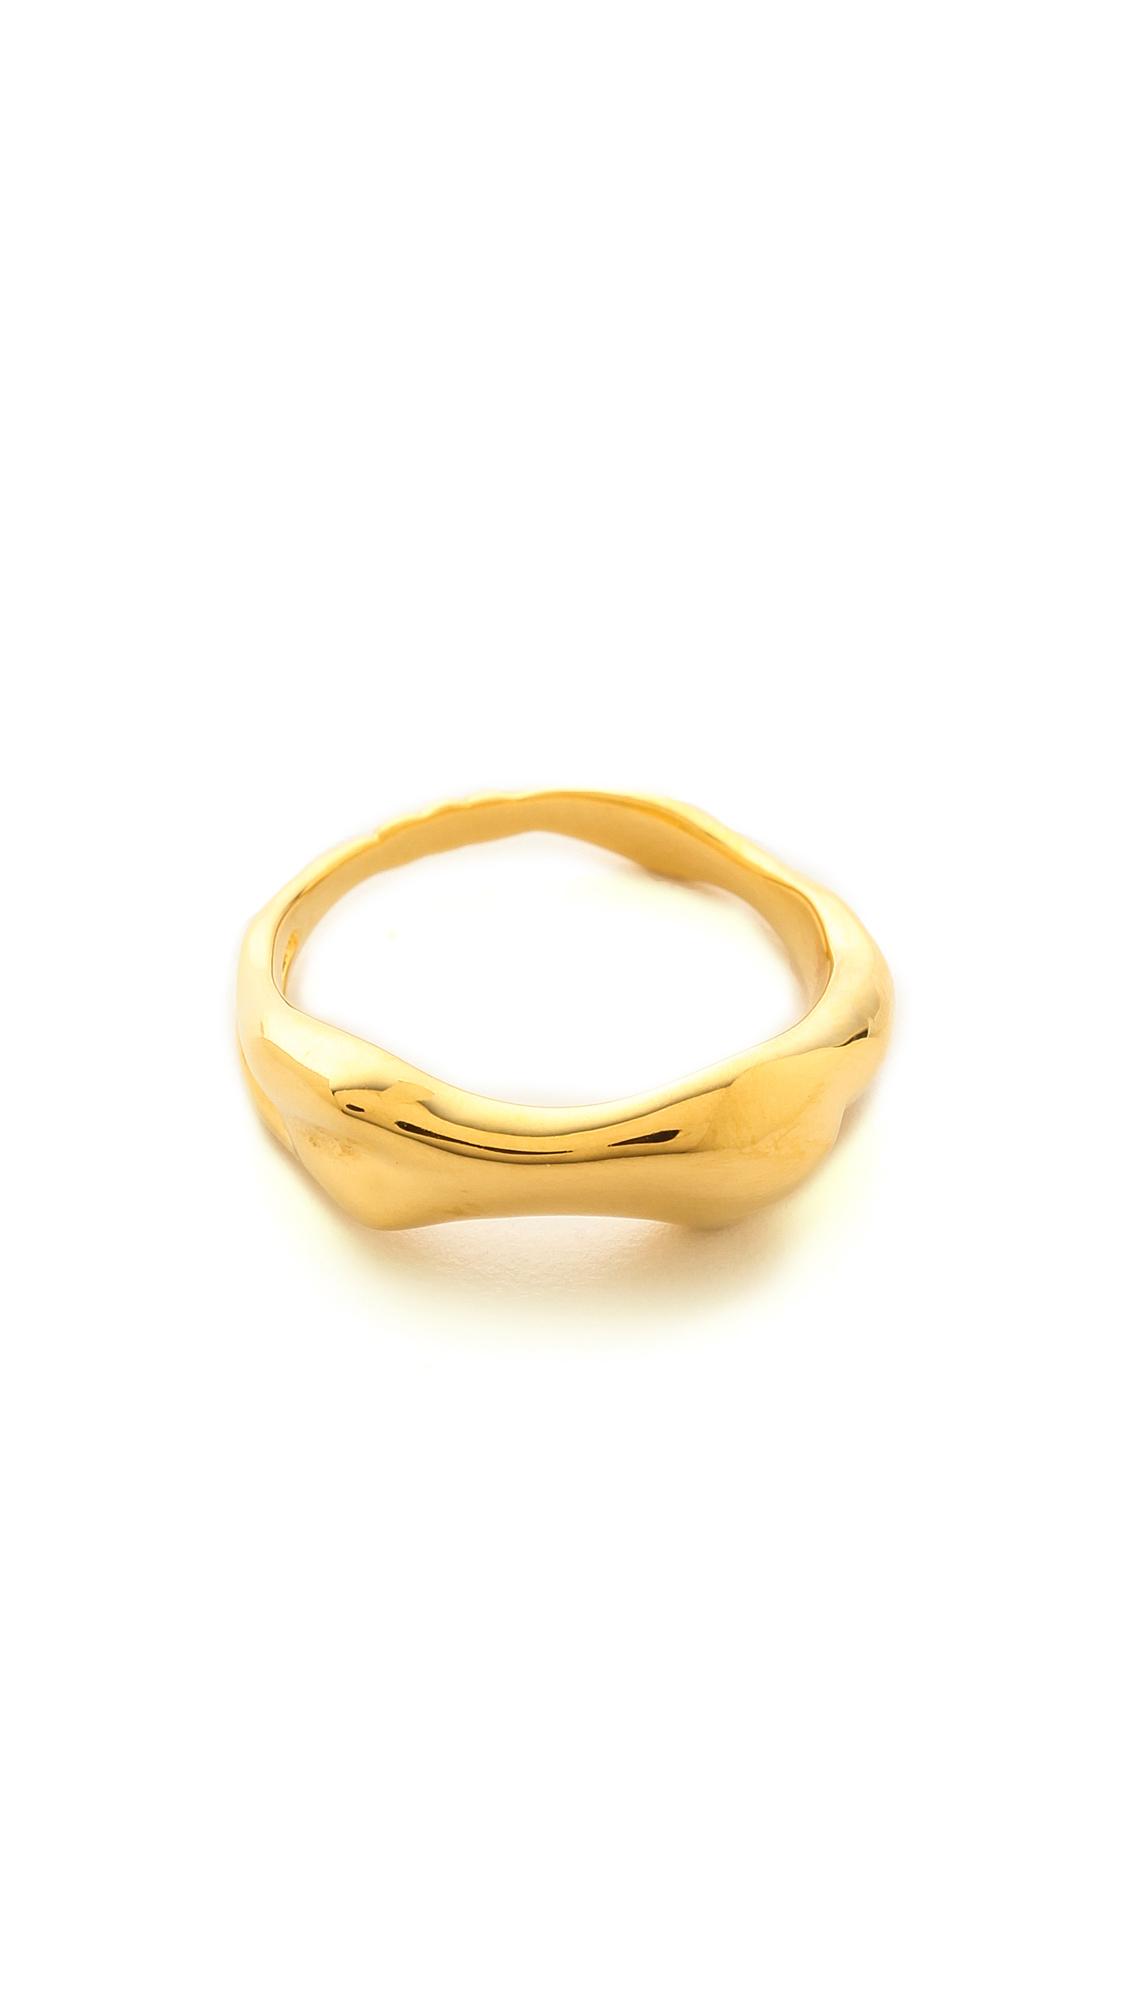 Aurelie Bidermann Body Ring - Gold at Shopbop